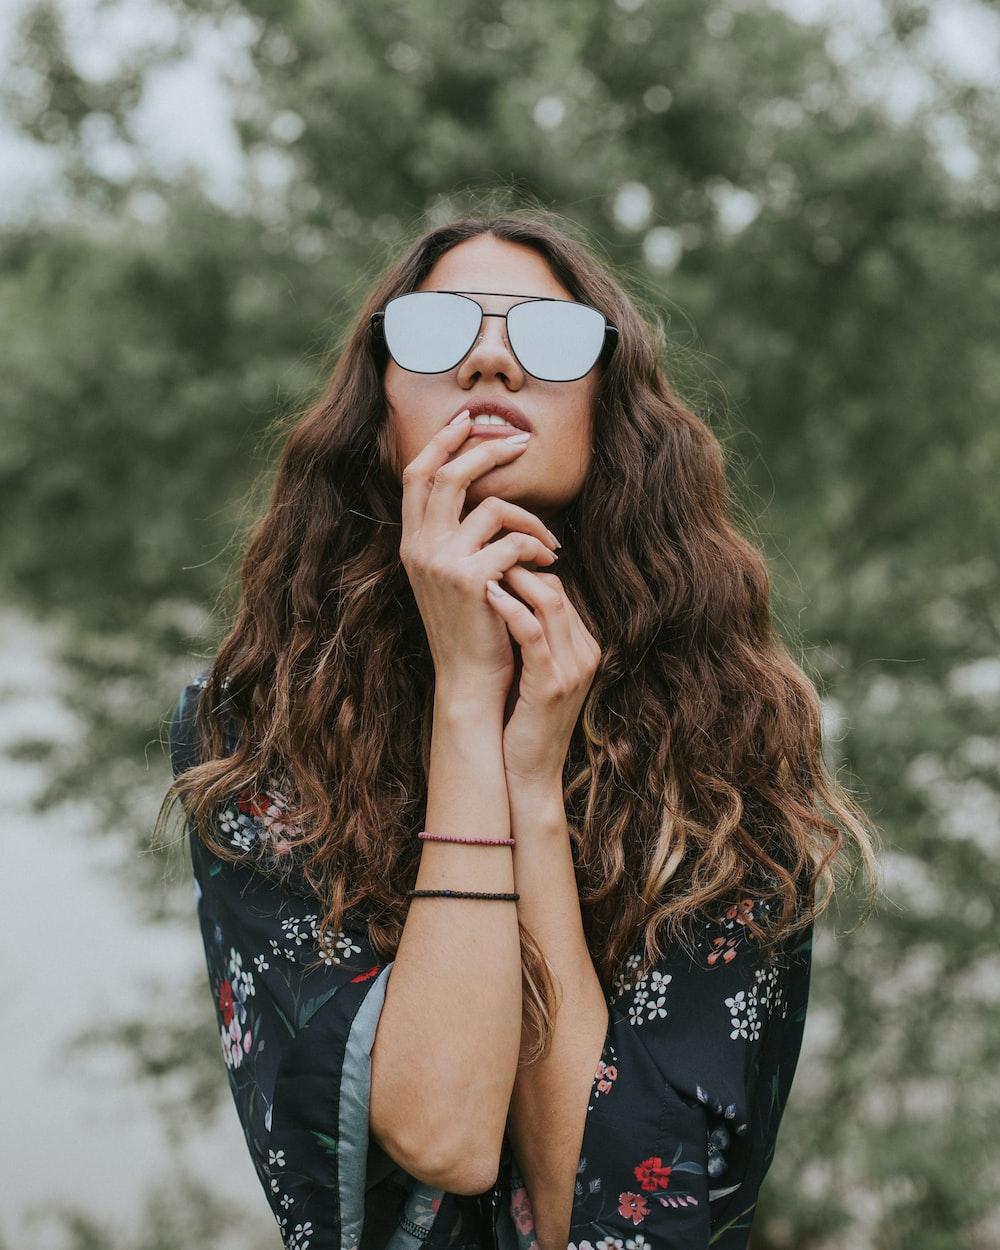 portrait photo of woman wearing sunglasses